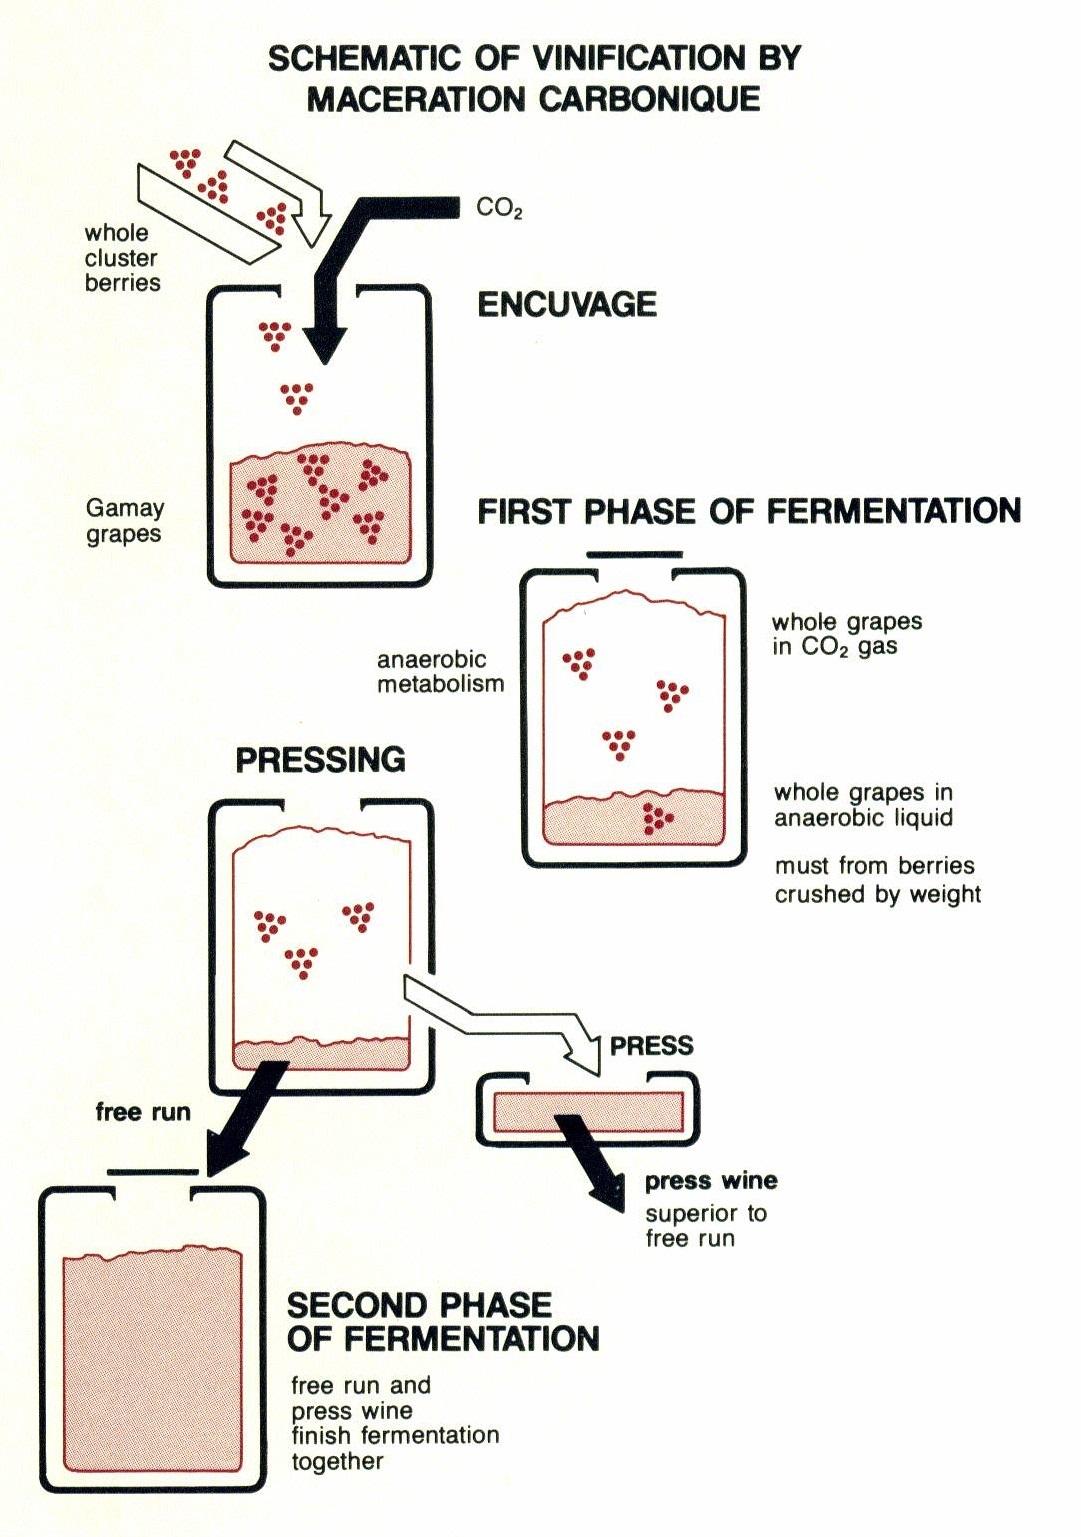 Carbonic maceration process